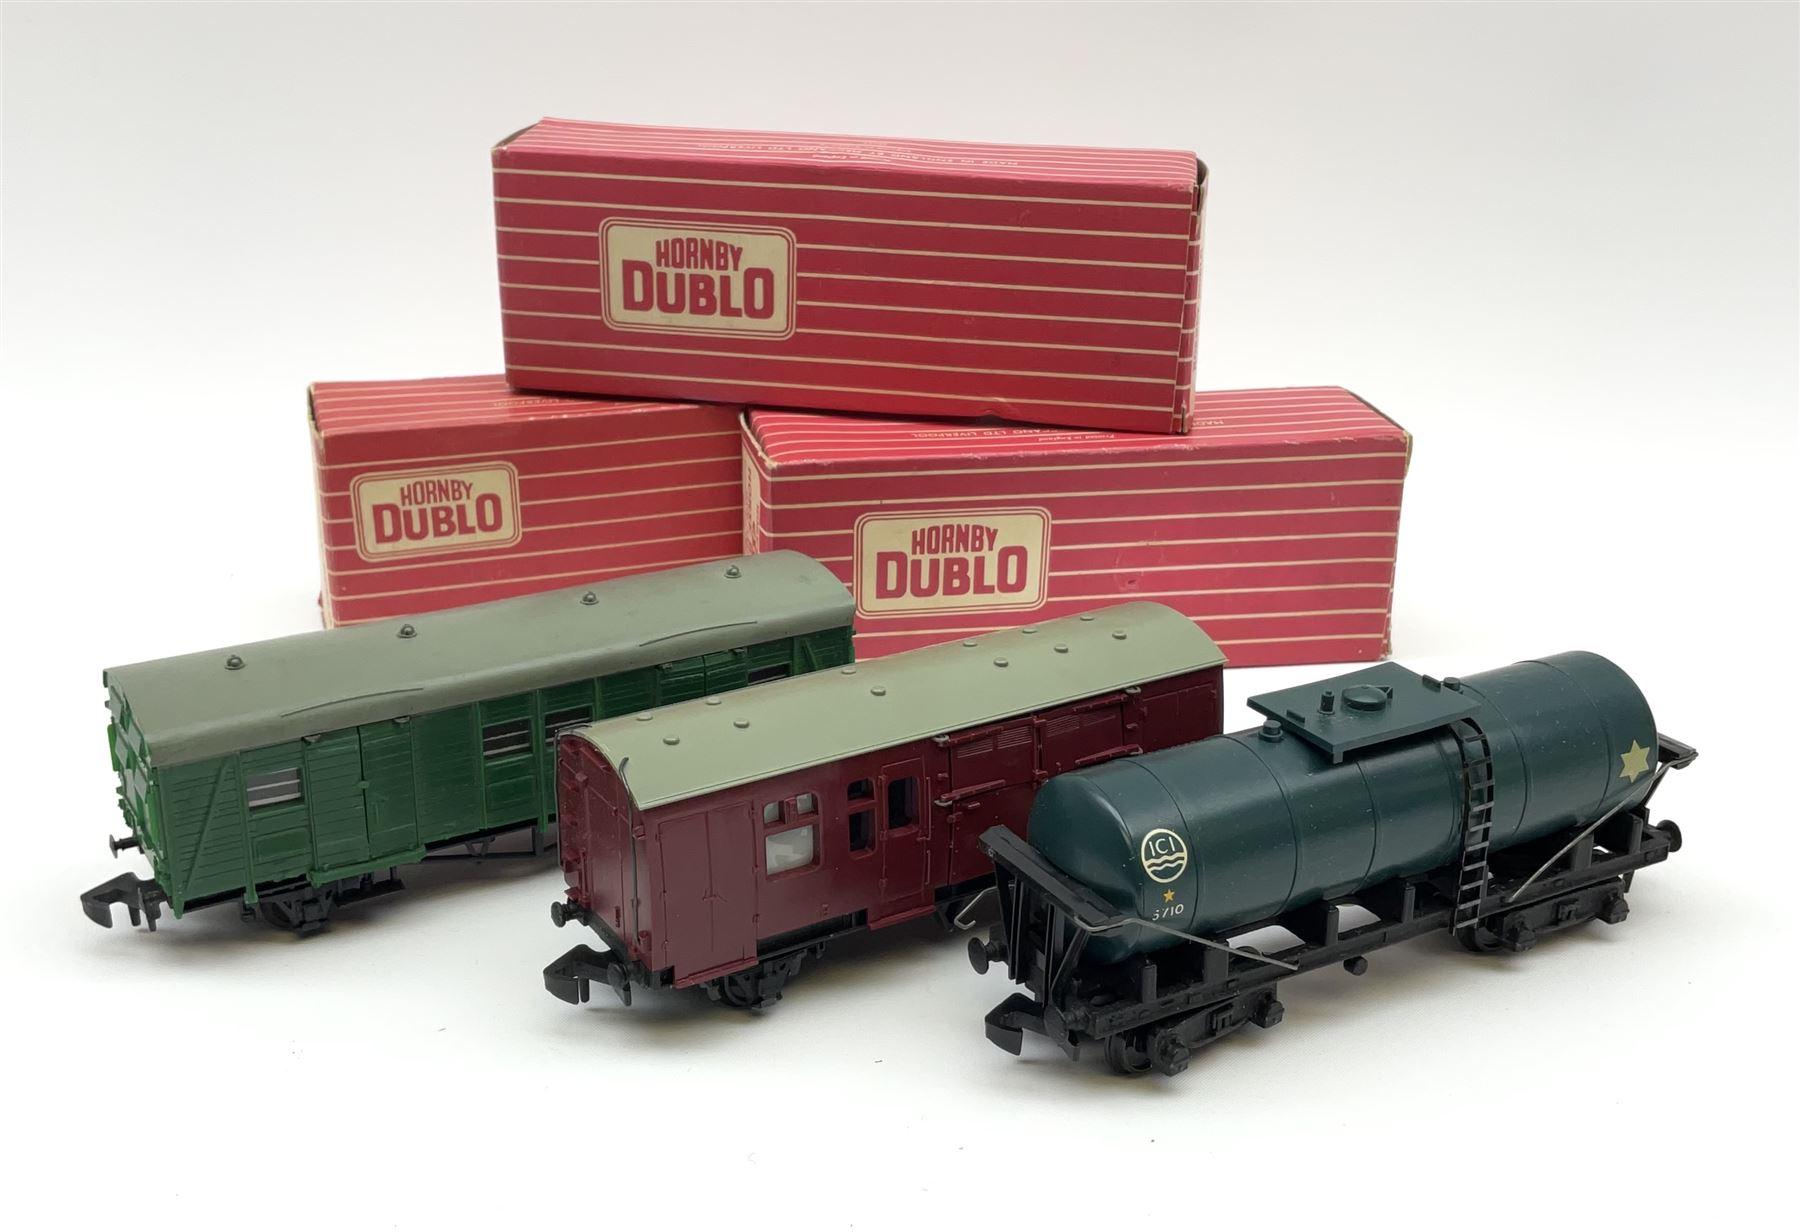 Hornby Dublo - 4685 Caustic Liquor Bogie Wagon; 4315 Horse Box with horse; and 4323 S.R. 4-Wheeled U